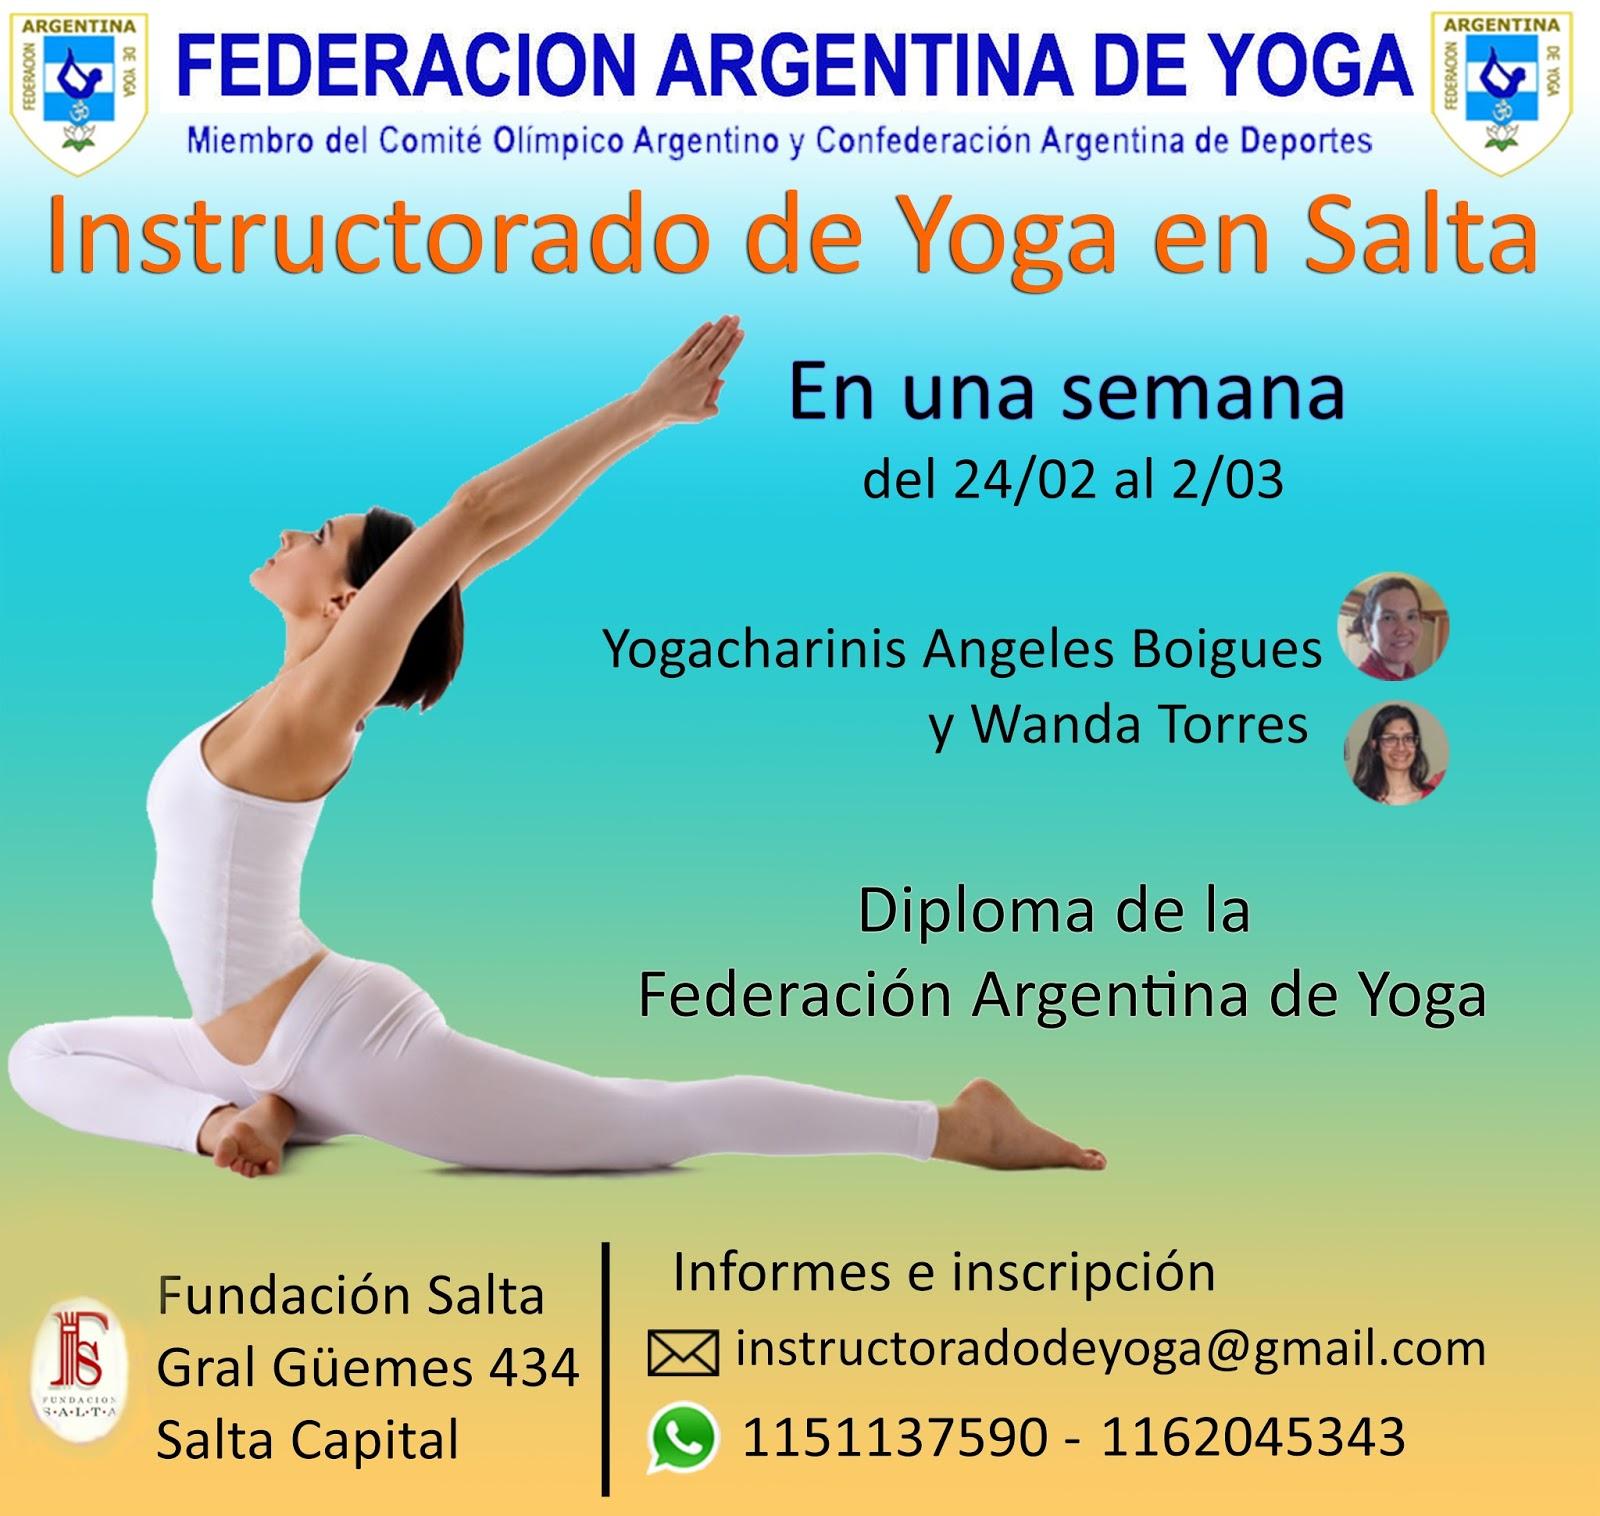 Centro De Yoga De Argentina 2016